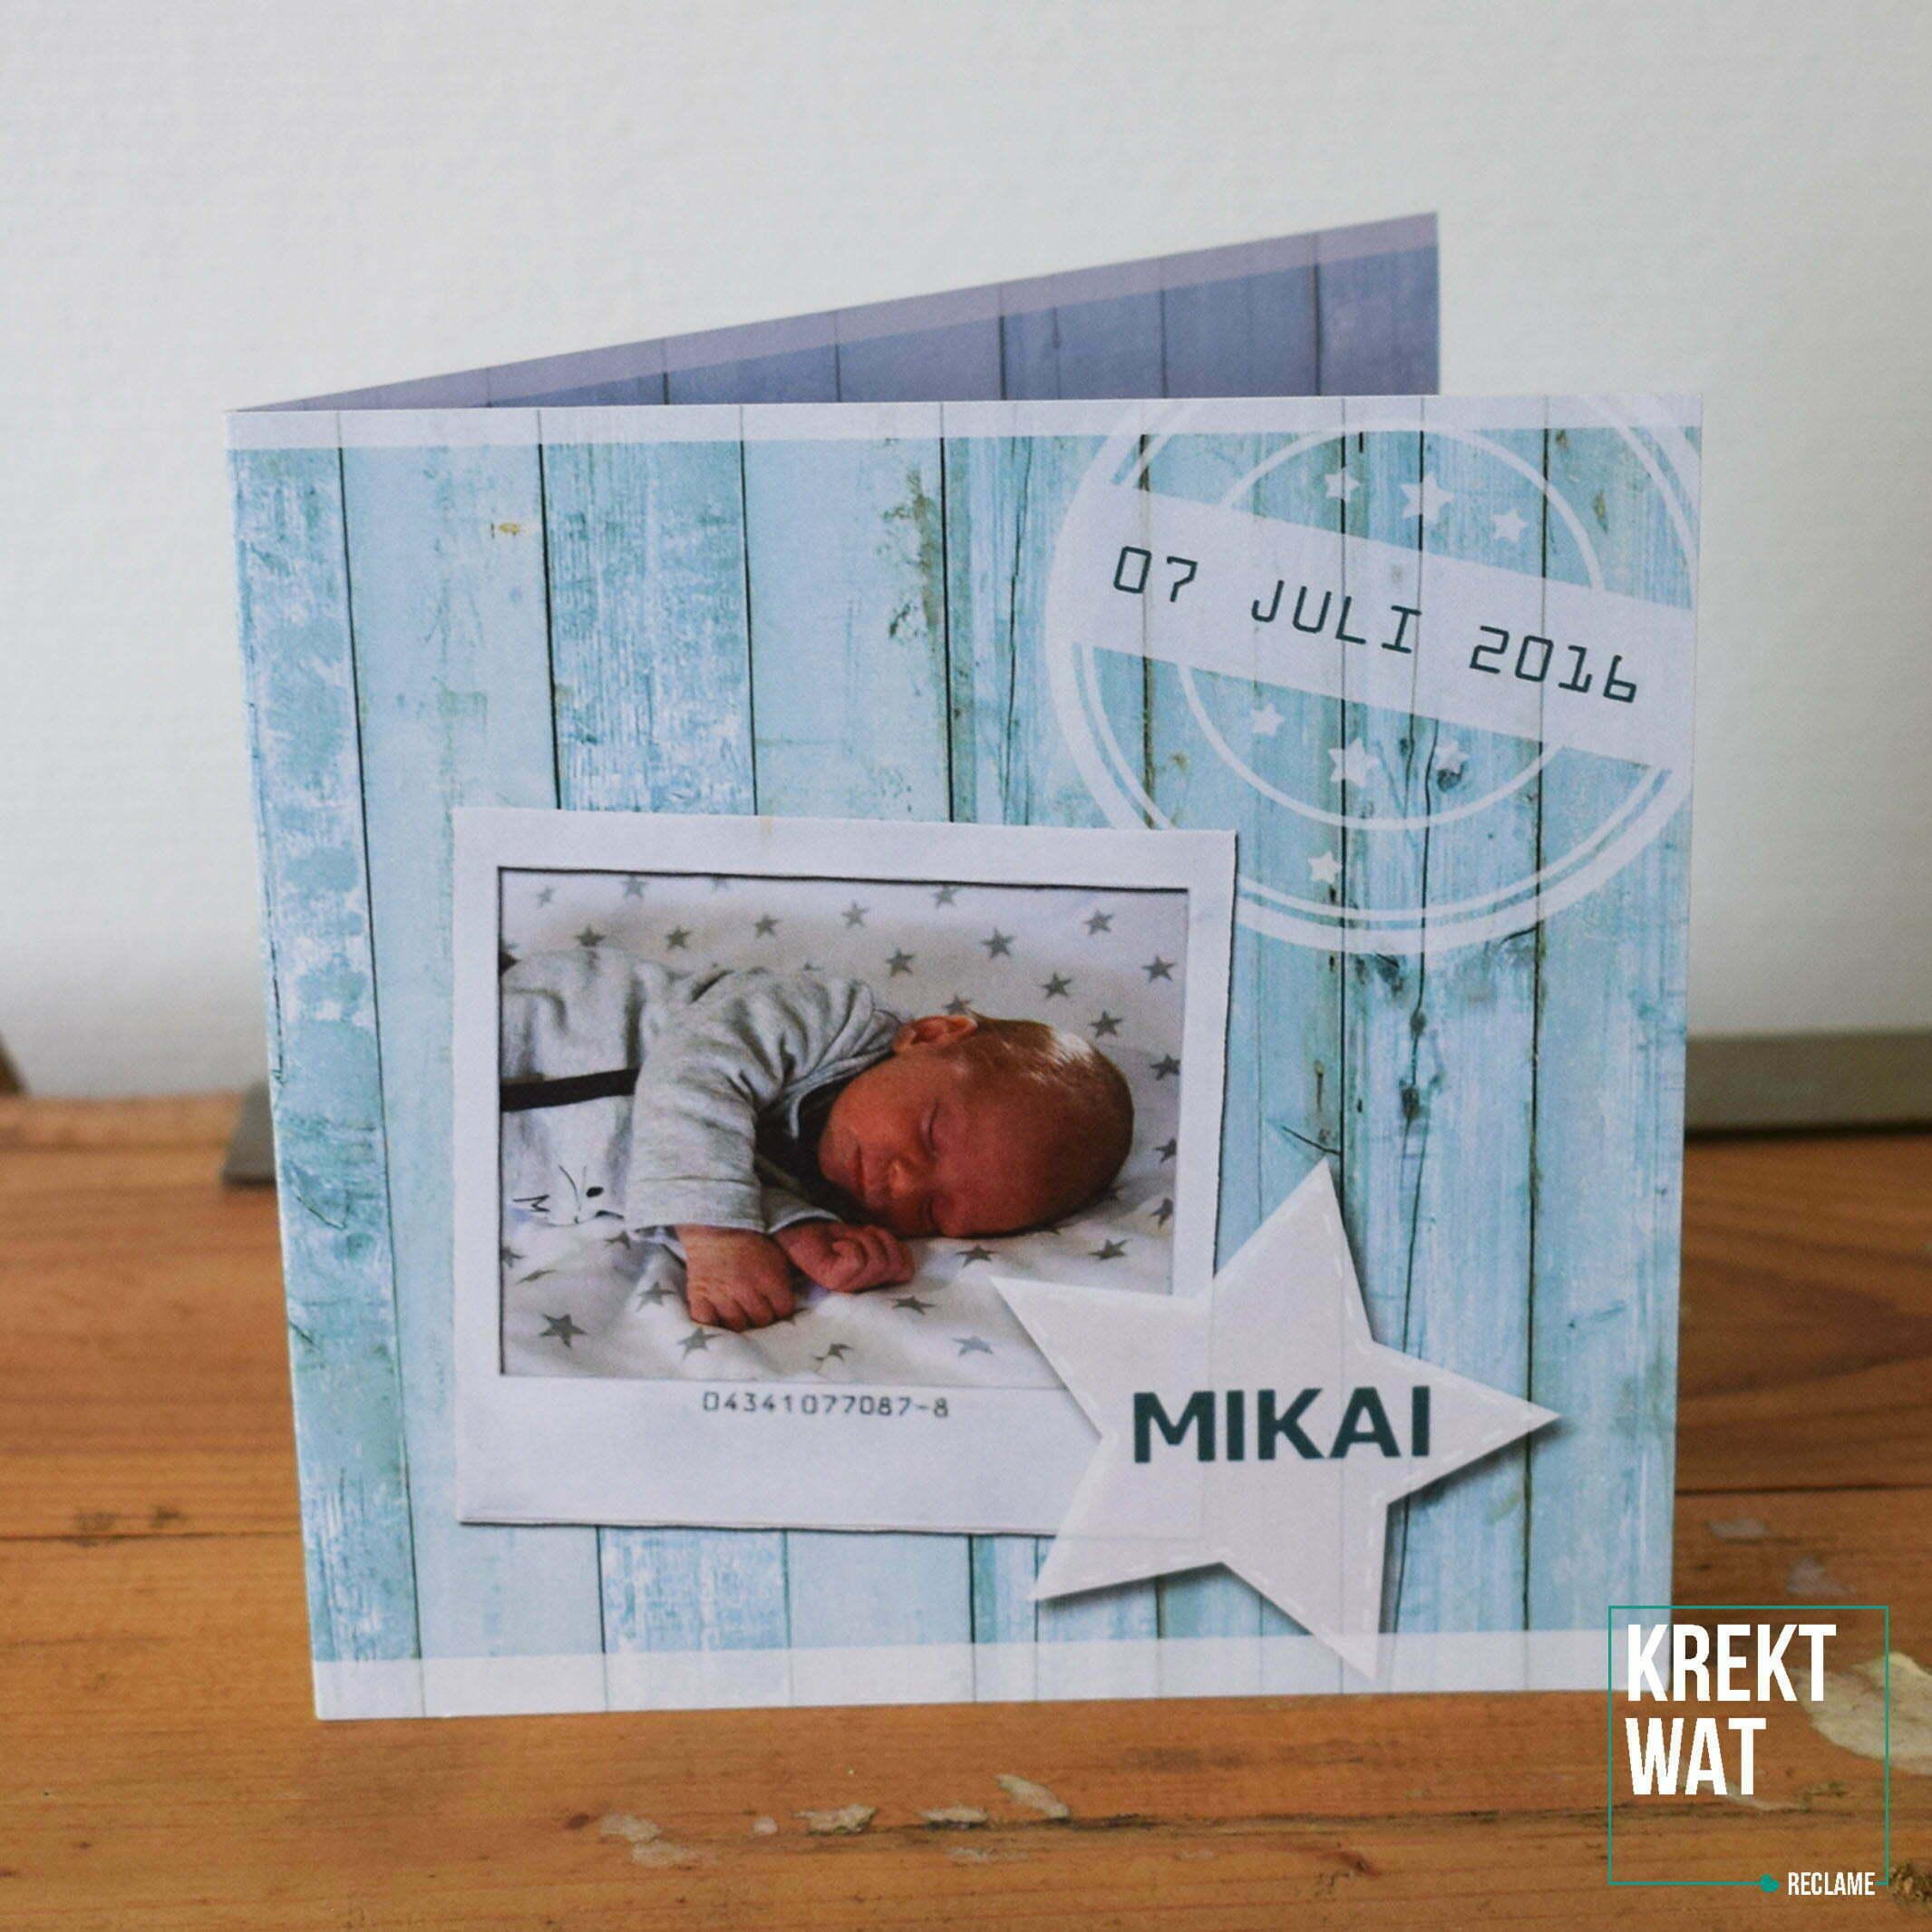 Geboortekaartje - Mikai